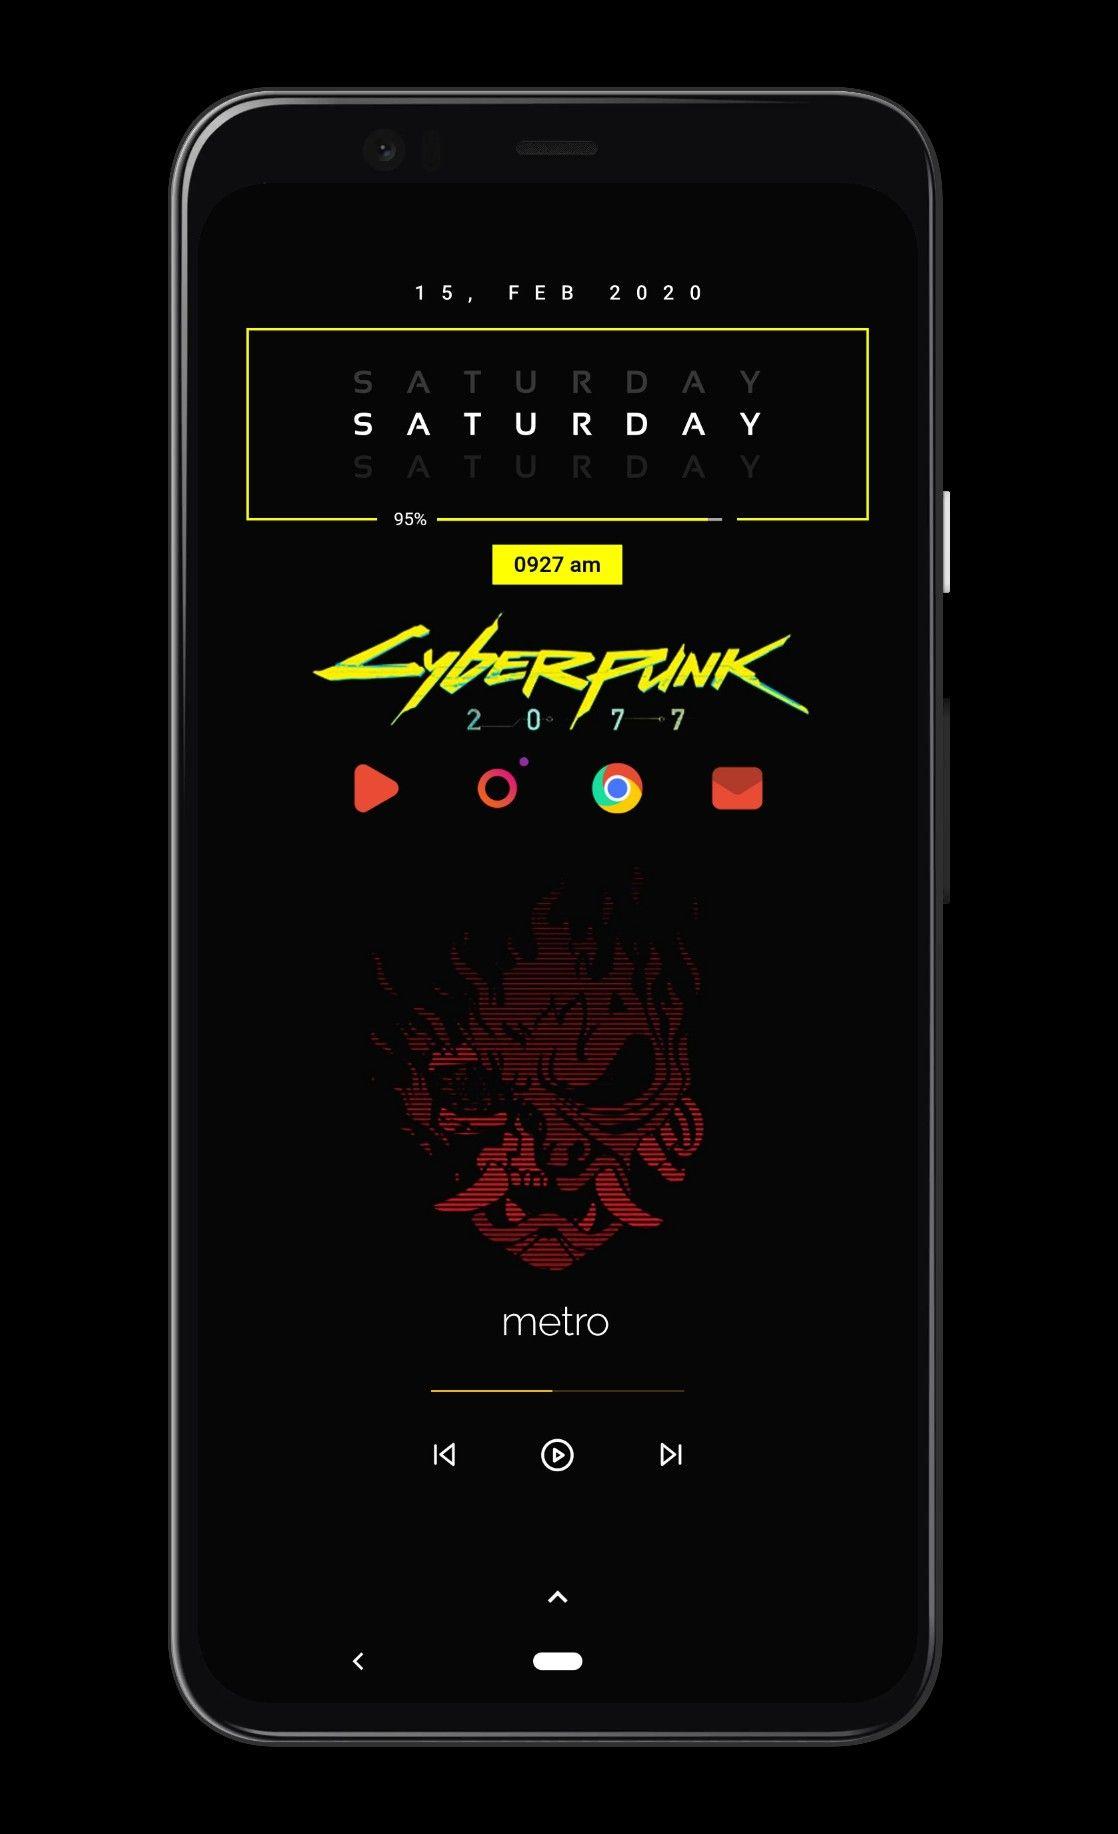 Cyberpunk 2077 Android Setup Android App Design Nova Launcher Mobile App Design Inspiration